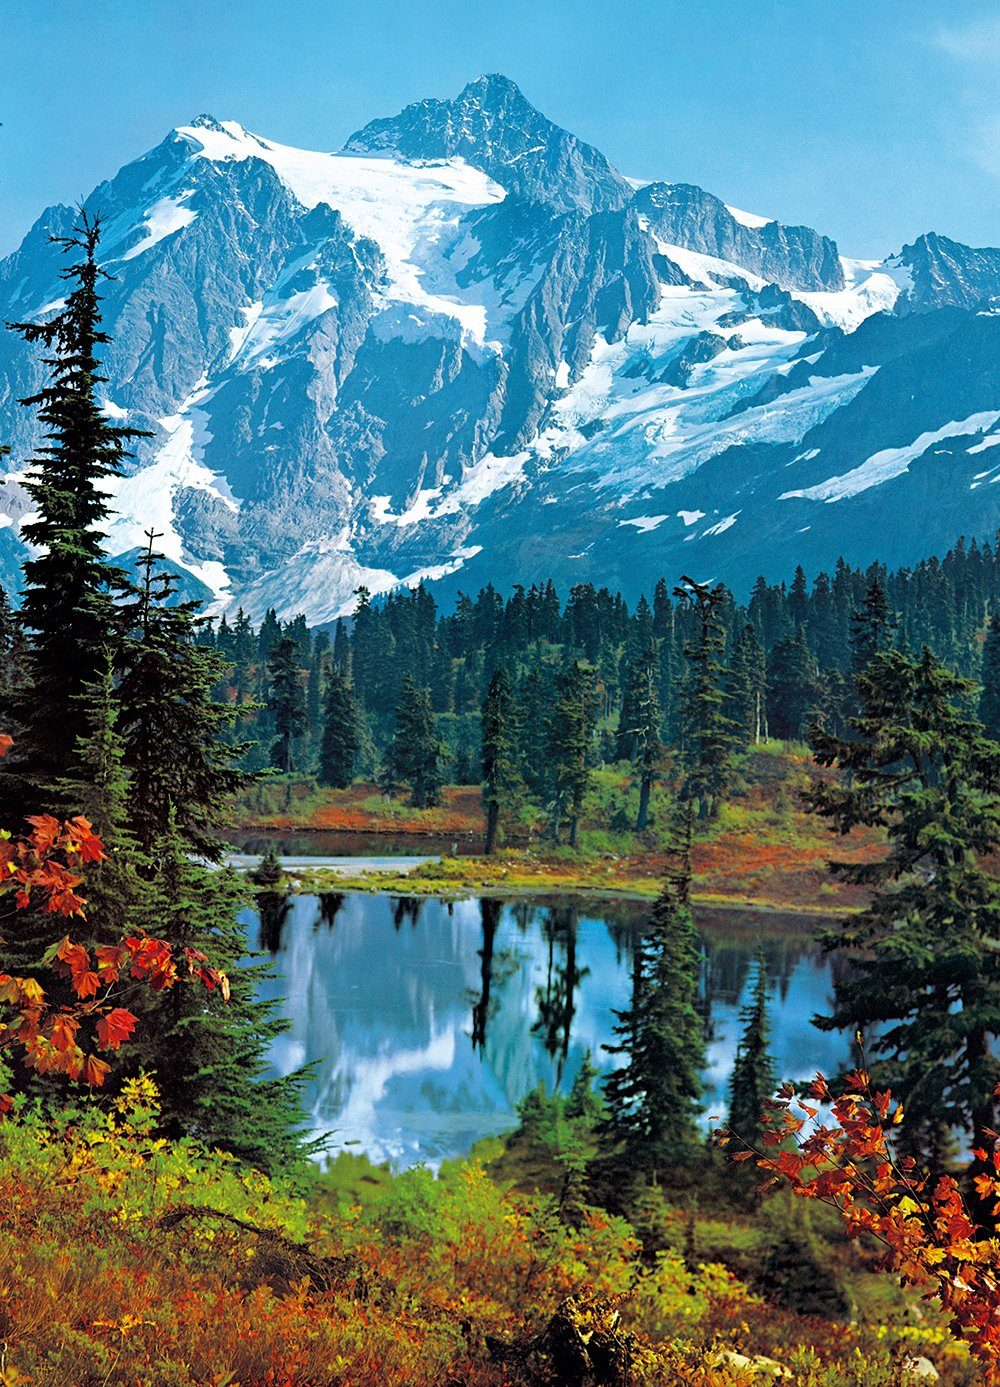 Fototapete »Mountain Peak«, 4-teilig, 183x254 cm